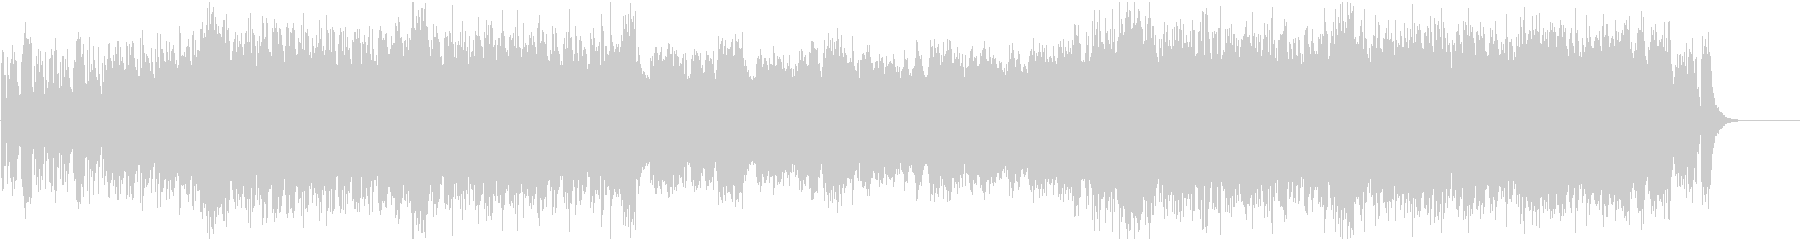 16bit, 48kHz version.'s unreproduced waveform